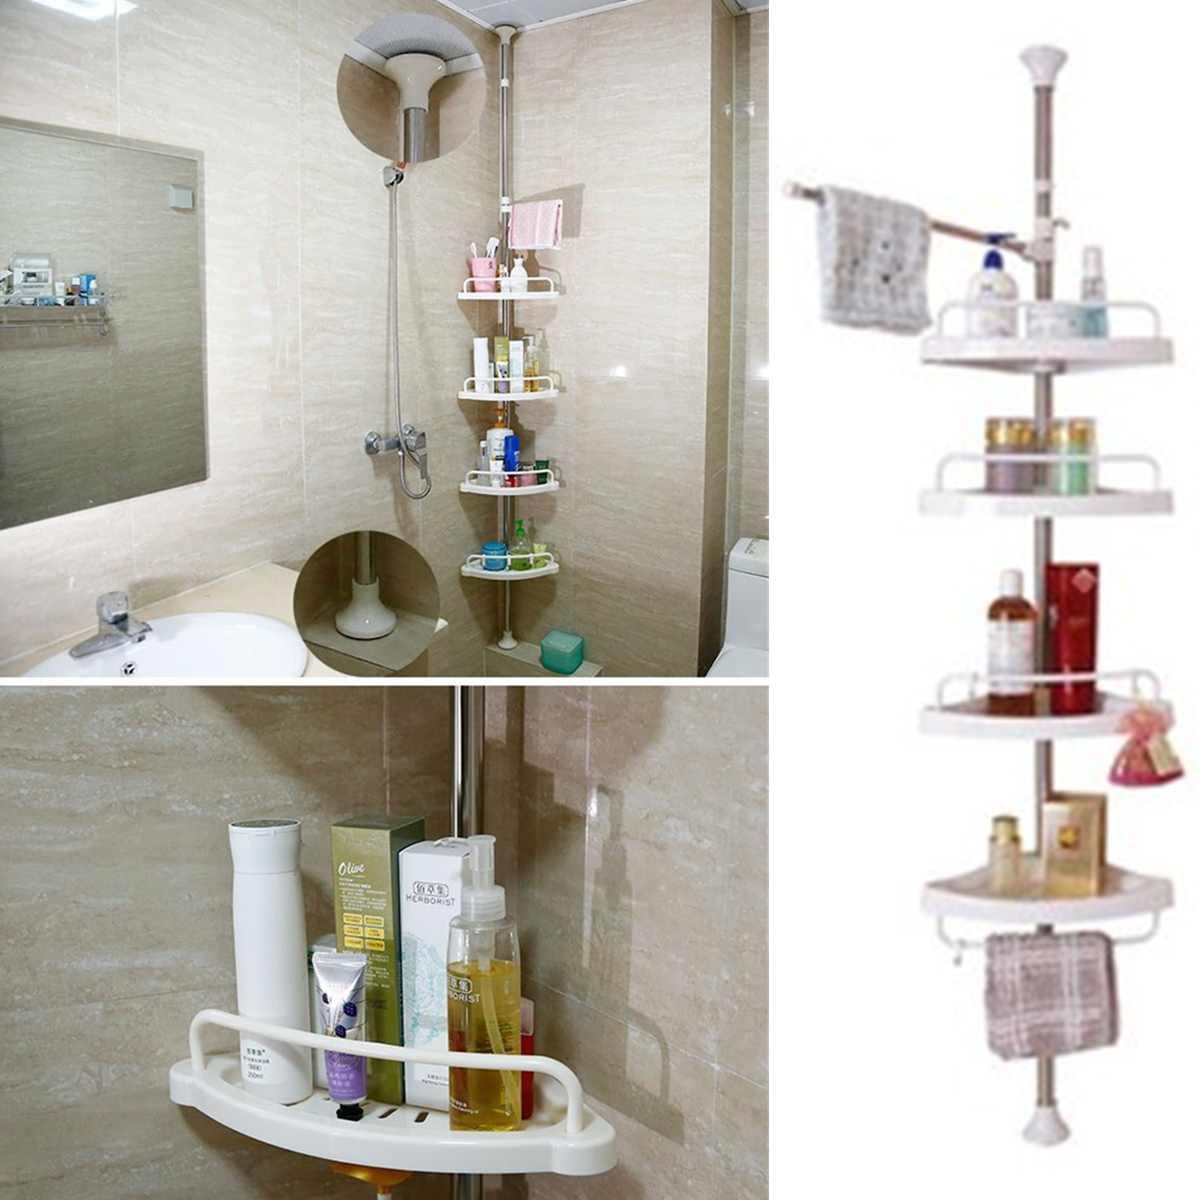 4 Tier Adjustable Telescopic Bathroom Corner Shower Shelf Rack Caddy Organiser Stainless Steel Pp 192 310cm Rust Free Pole Bathroom Shelves Aliexpress